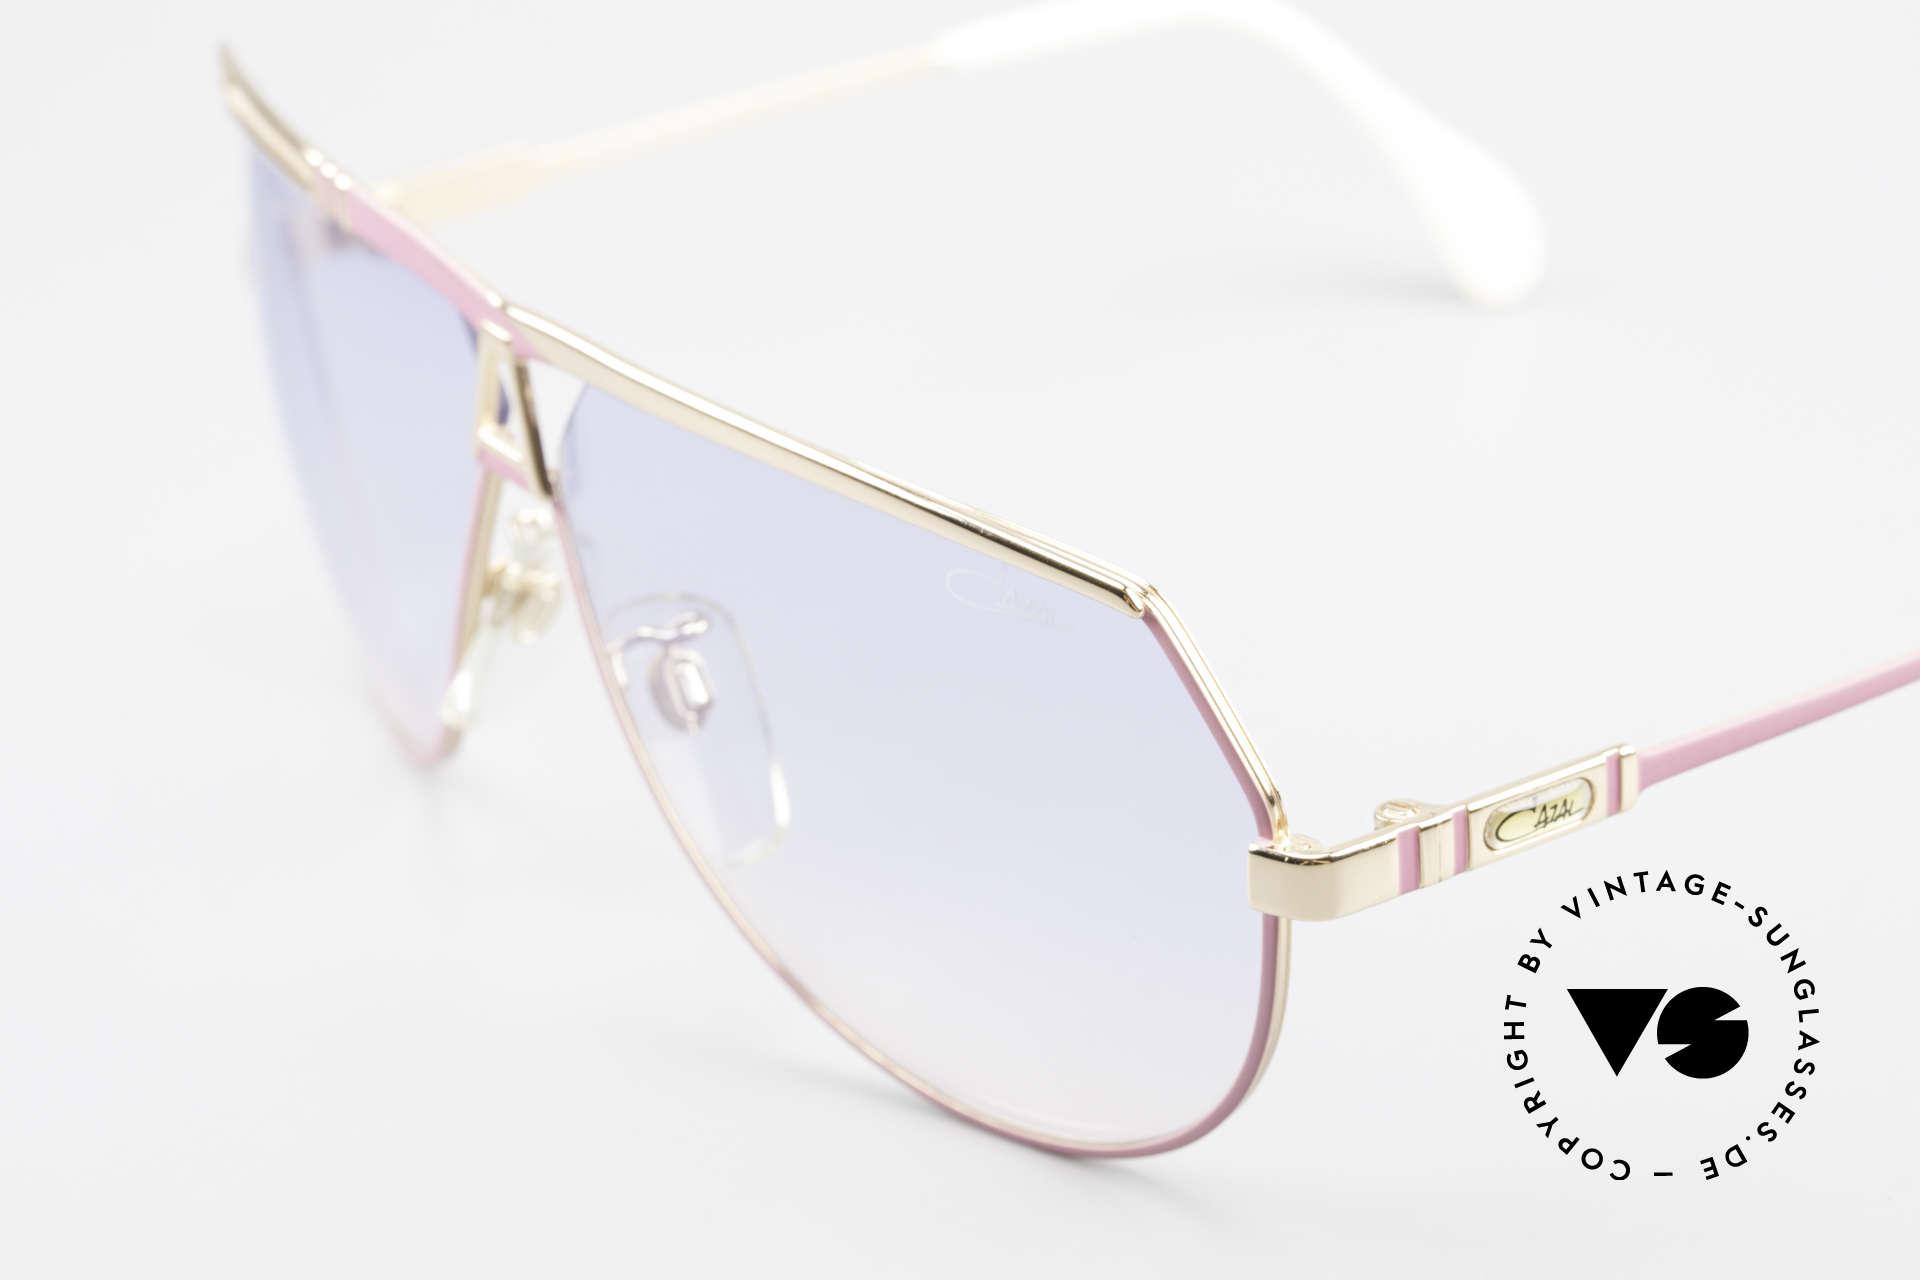 Cazal 954 Oversized 80's Sunglasses, unworn (like all our legendary VINTAGE Cazals), Made for Women